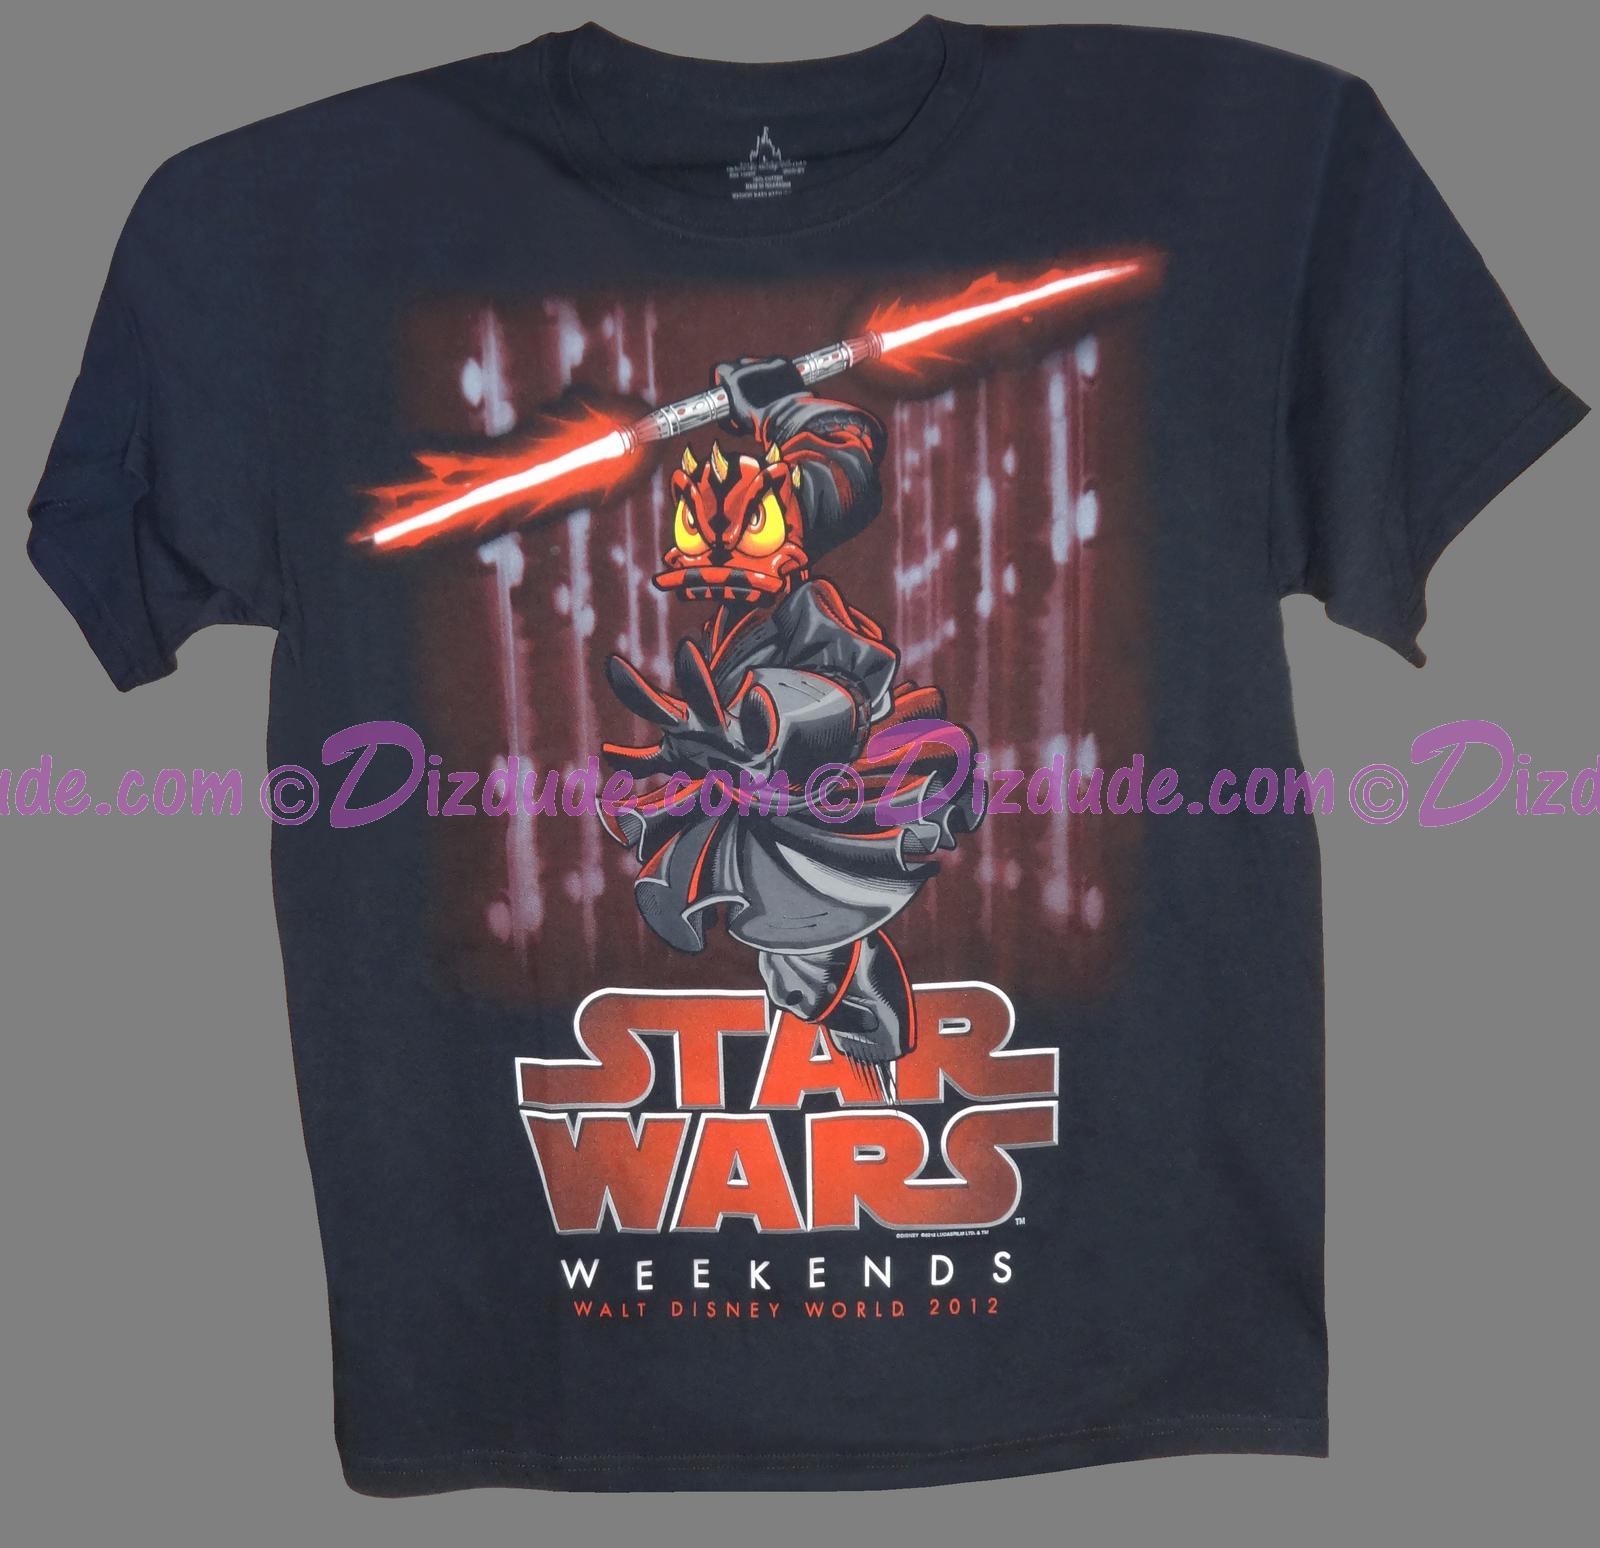 Original One of a kind Prototype Logo T-shirt - Disney Star Wars Weekend 2012 © Dizdude.com